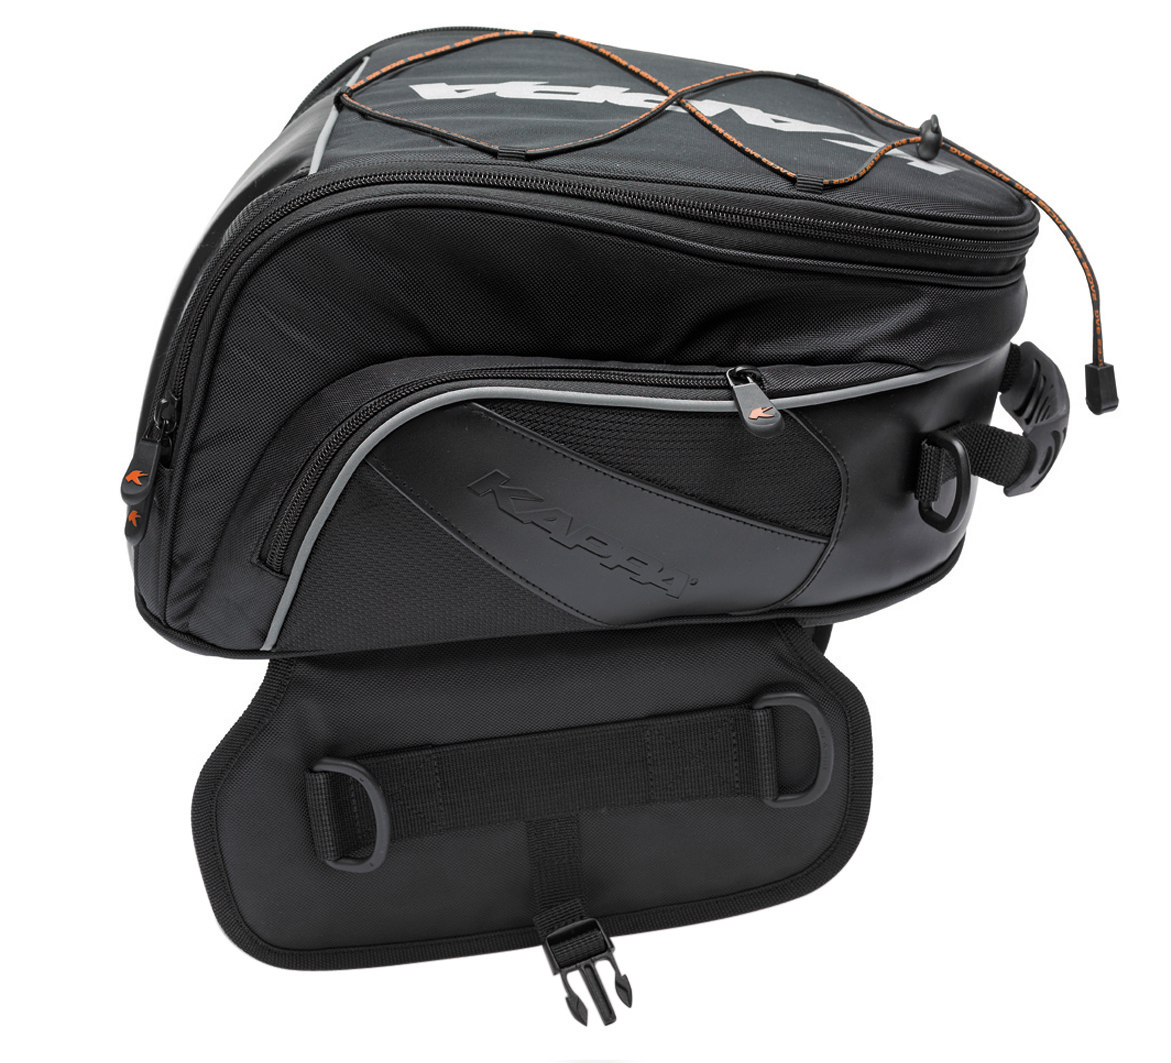 ac534e46cdf RA300 - Tail bags